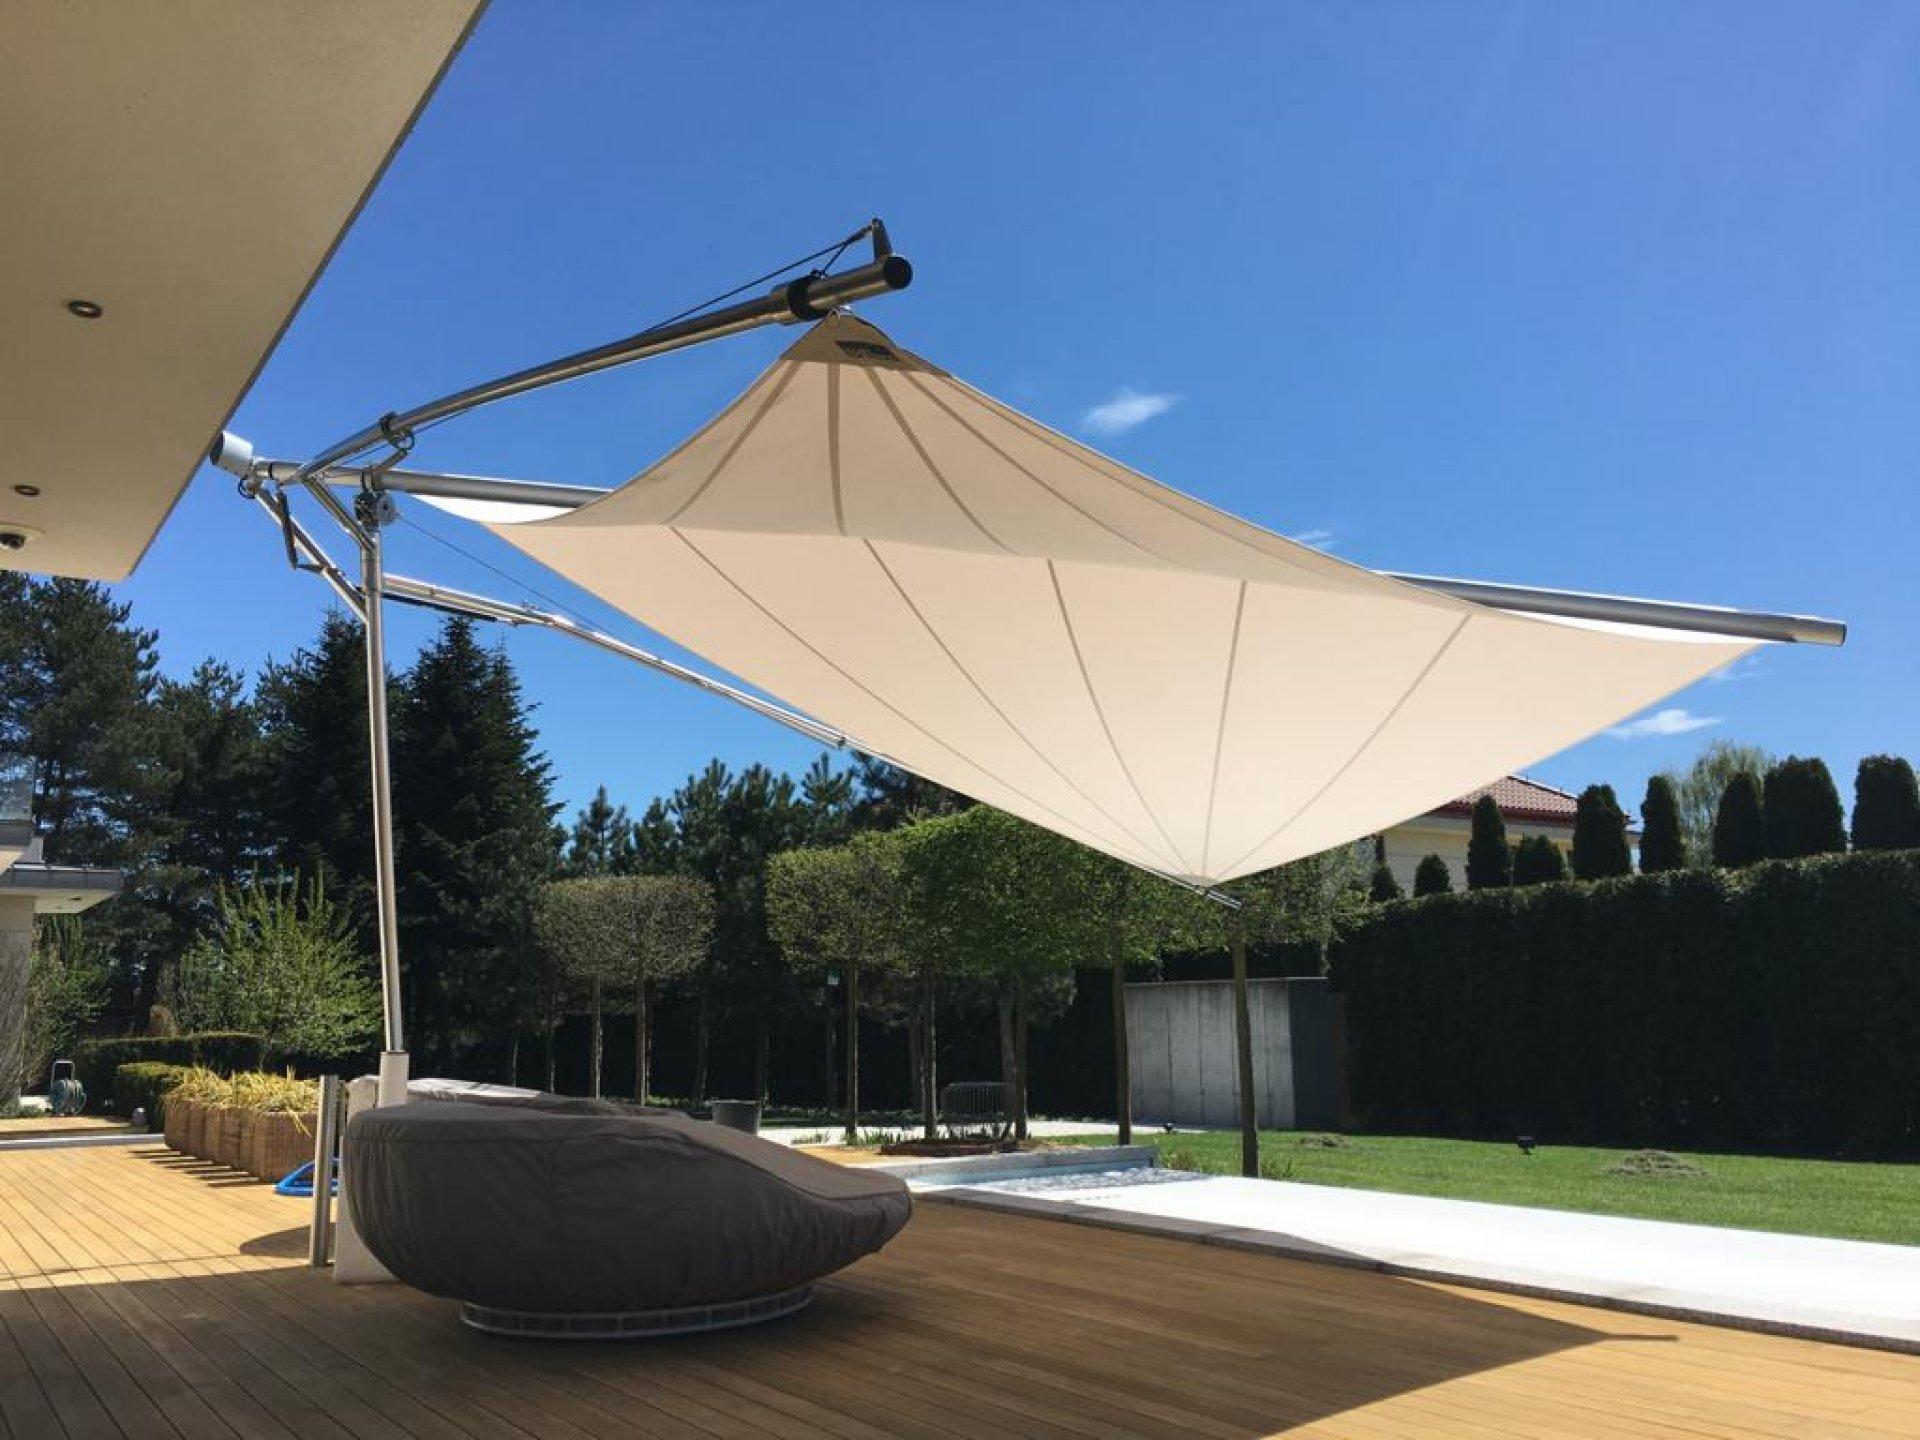 SunSquare Parasol: Fold & Roll